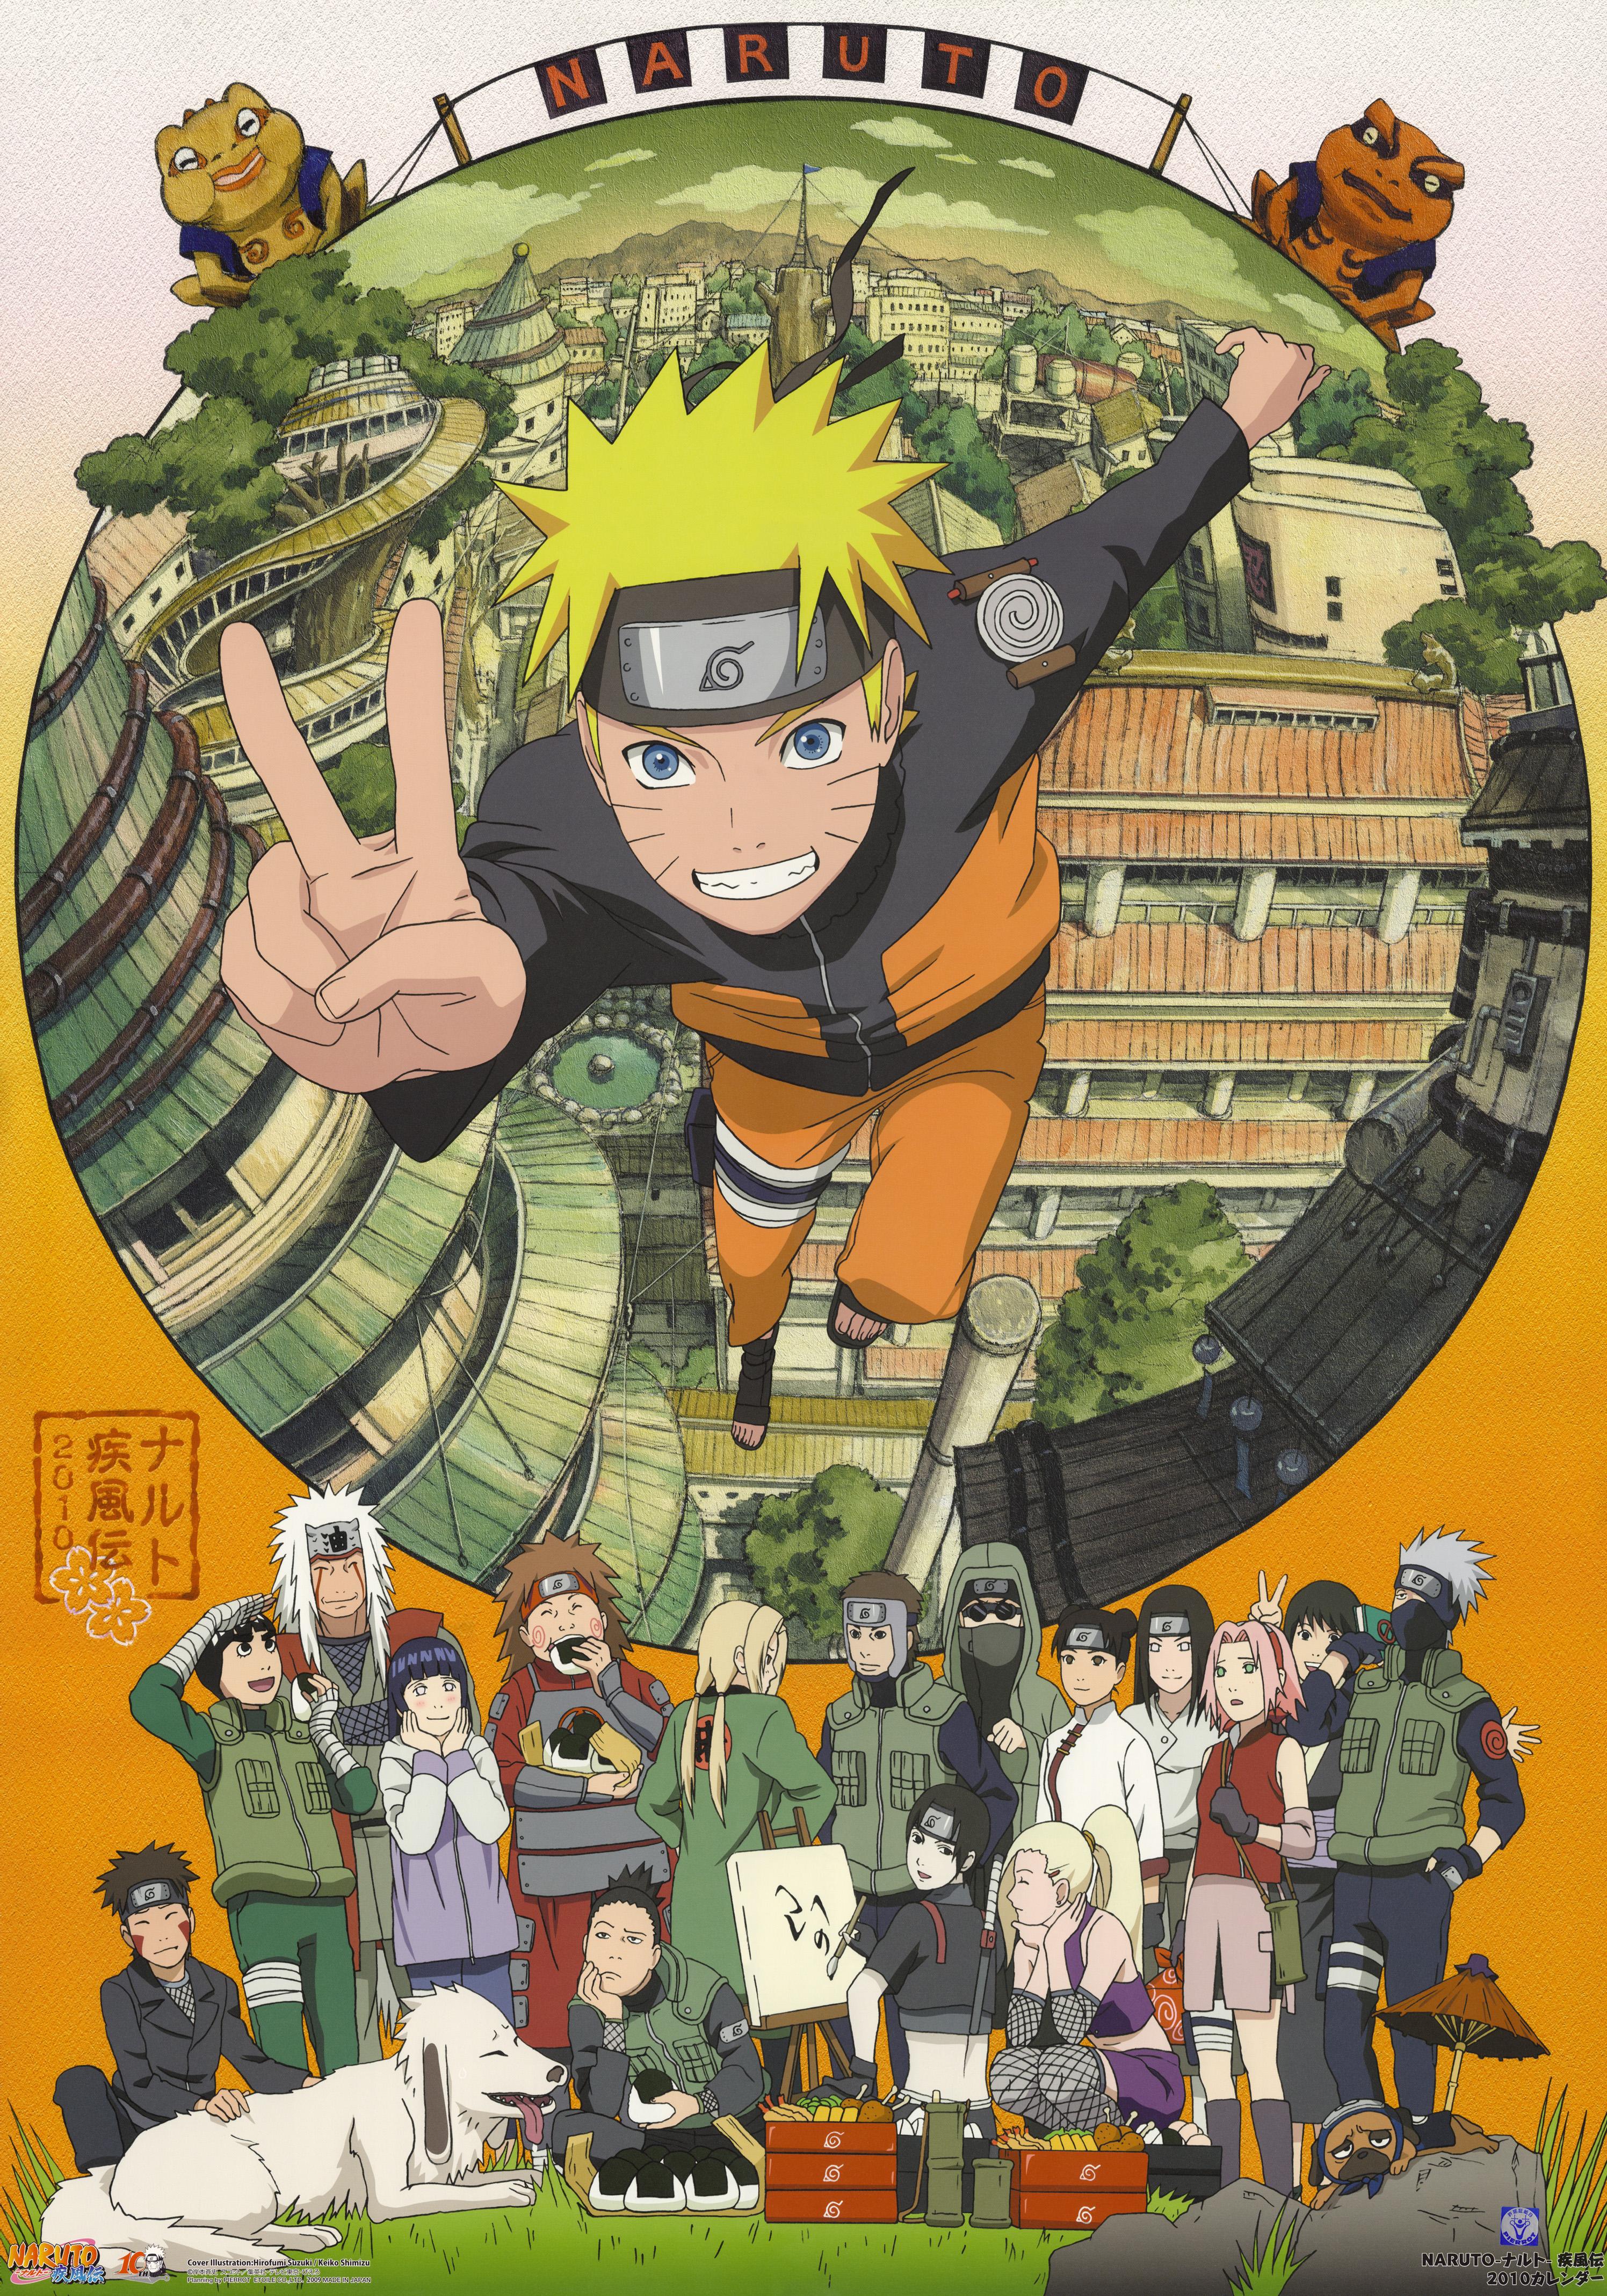 Download Wallpaper Naruto Friend - NARUTO  Best Photo Reference_798941.jpg